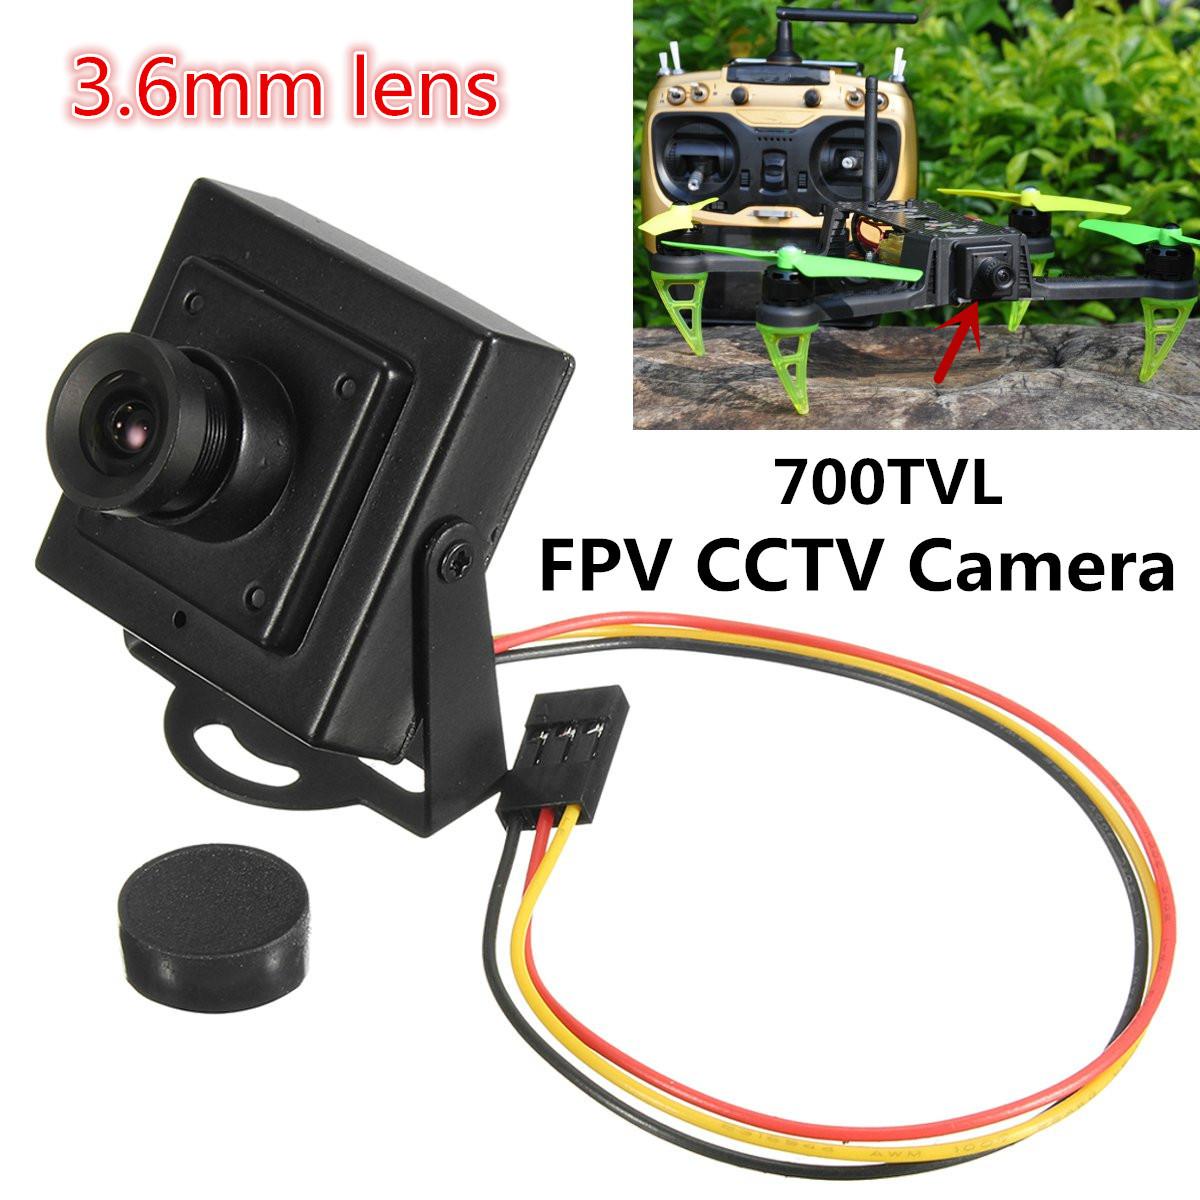 "700TVL 3.6mm Lens 1/3 CMOS PAL Mini FPV CCTV Camera Family Monitor"" - Photo: 2"